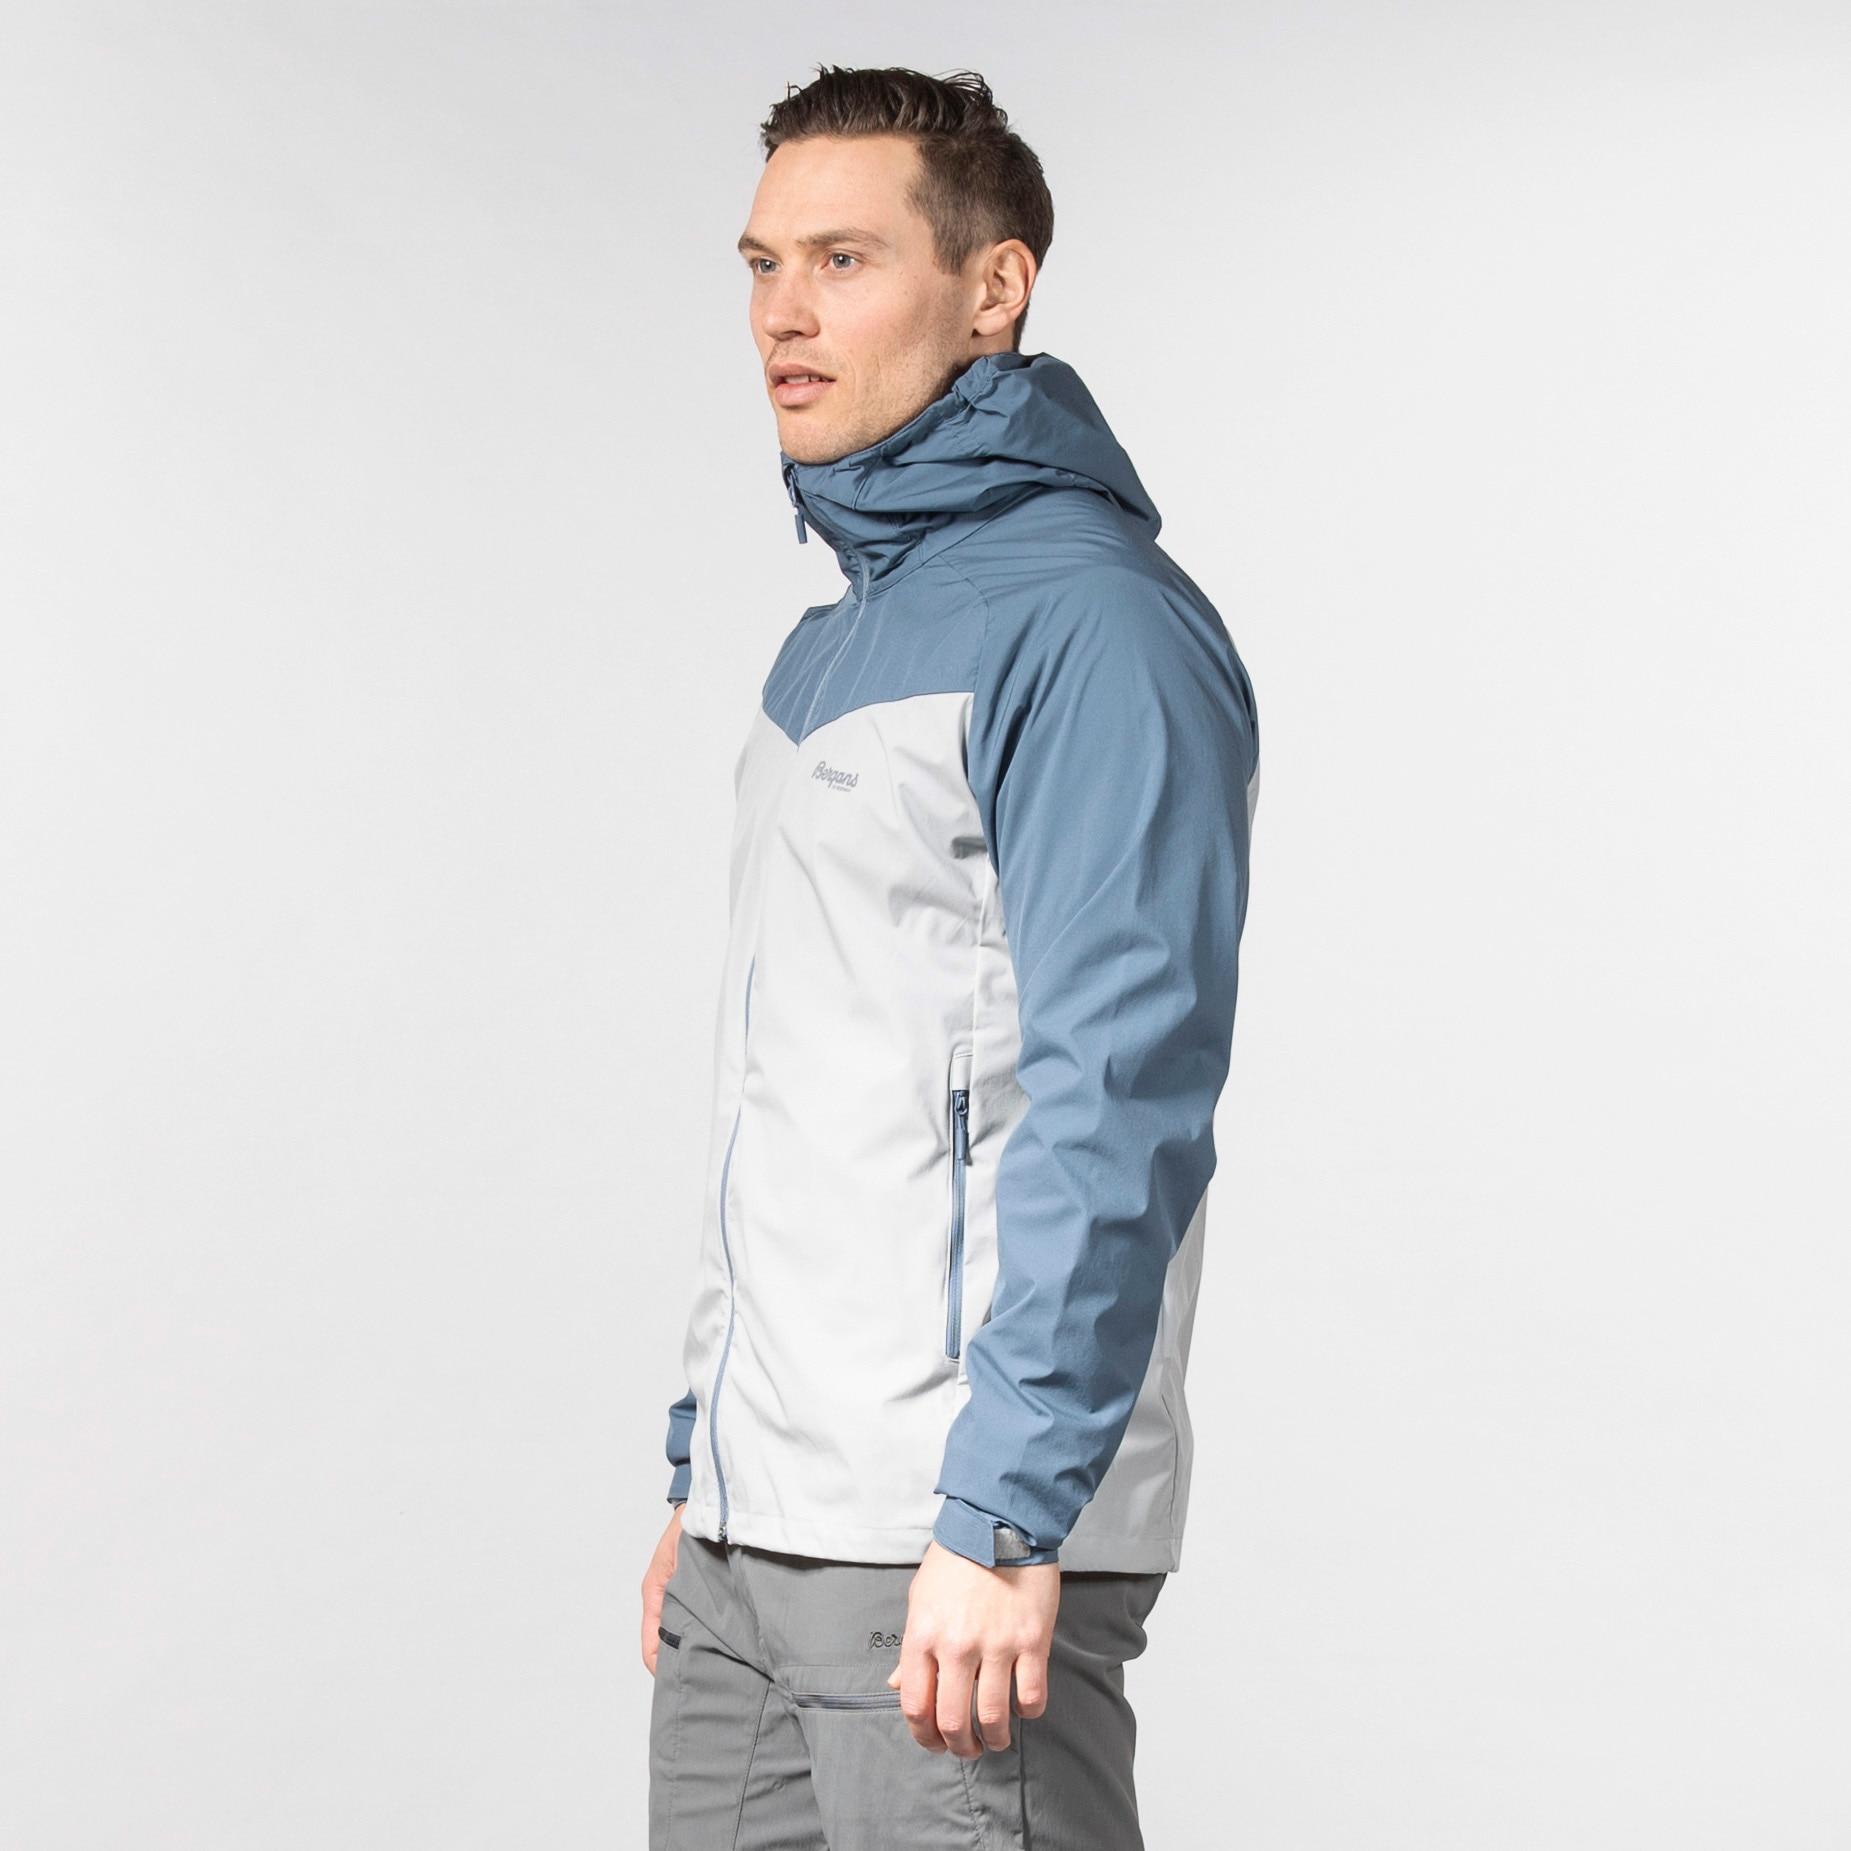 Microlight Jacket